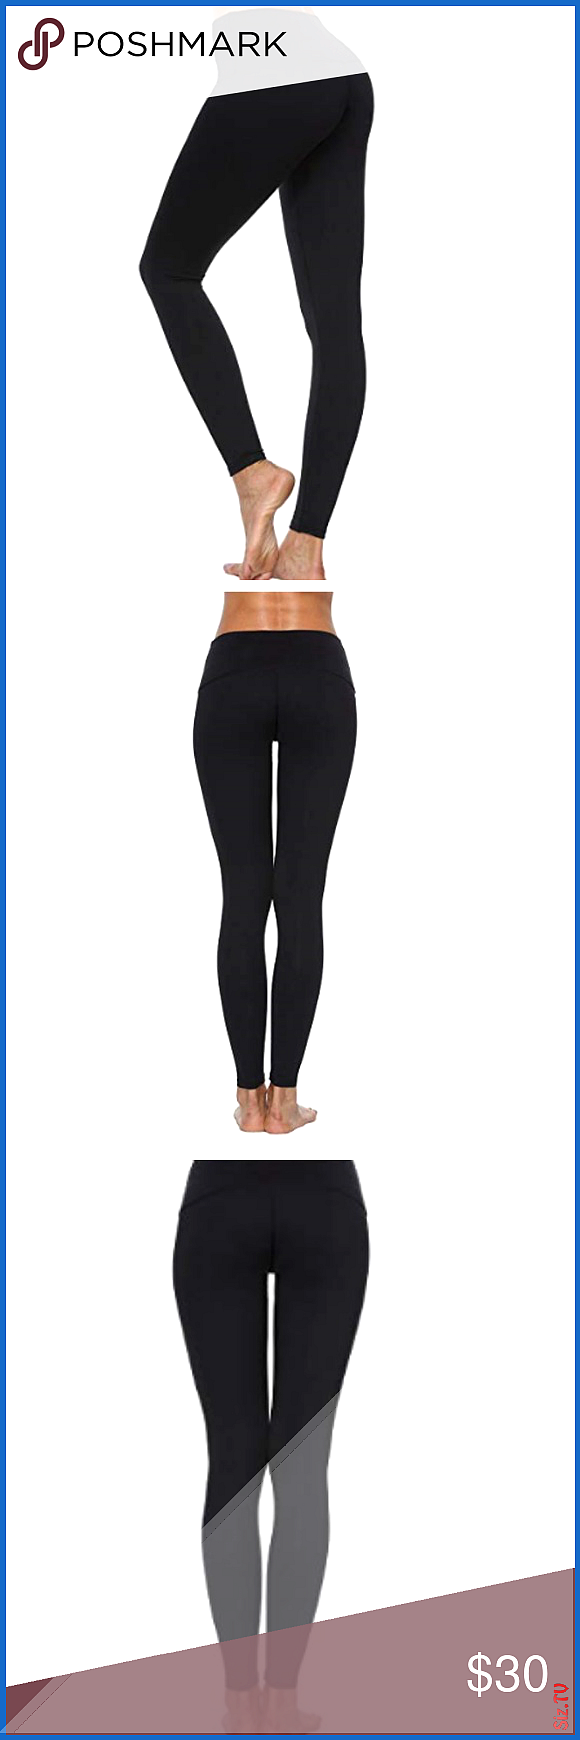 Tummy Control Workout Yoga Pants  Leggings Stretch 038 Non See-through Fabric Perfect for yoga exerc...